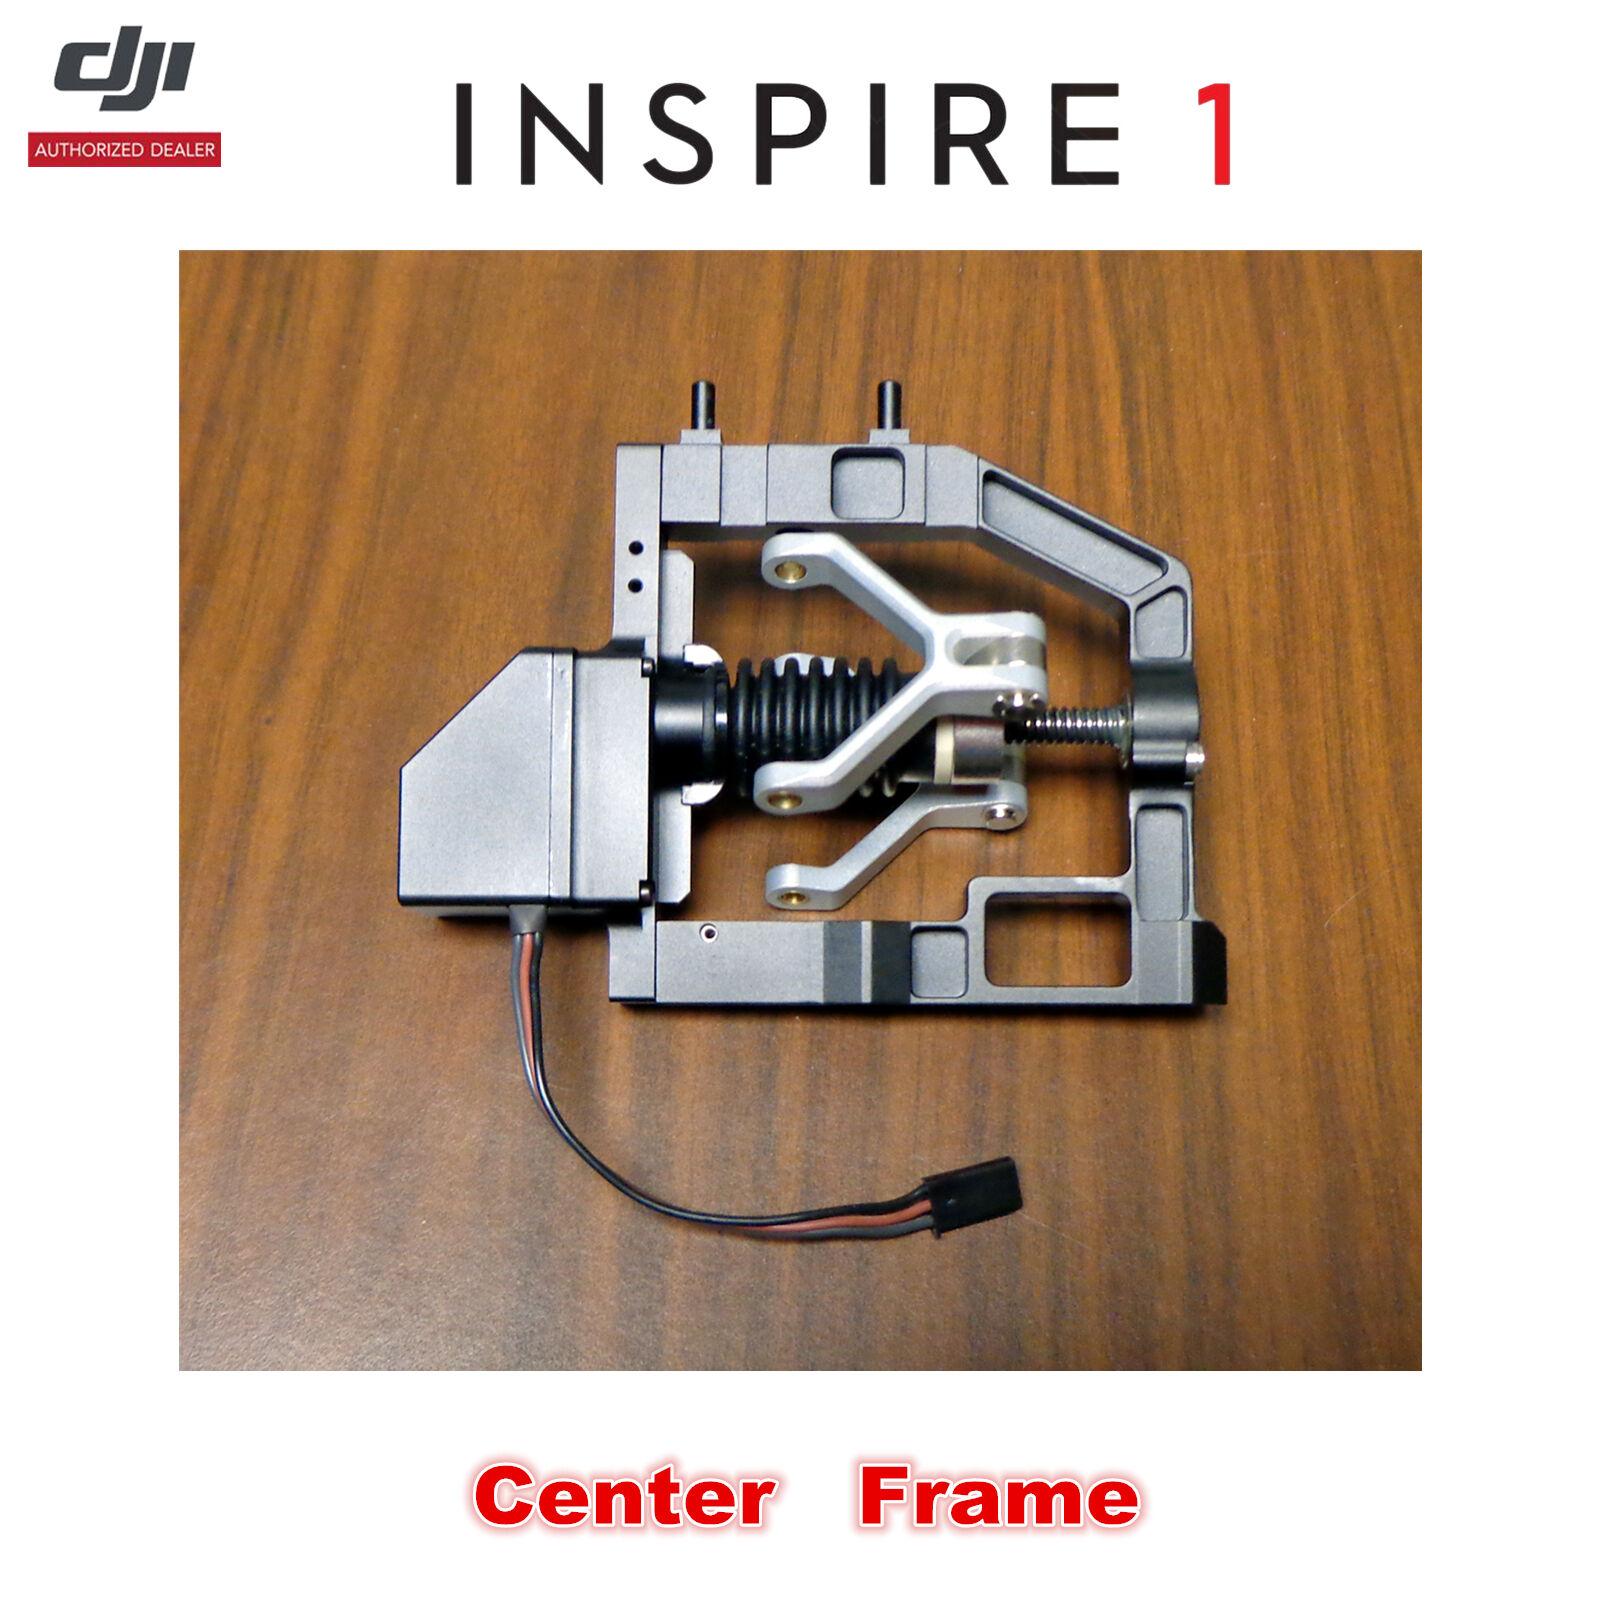 dji inspire 1 v2 0 pro wm610 drone part 2 center frame assembly